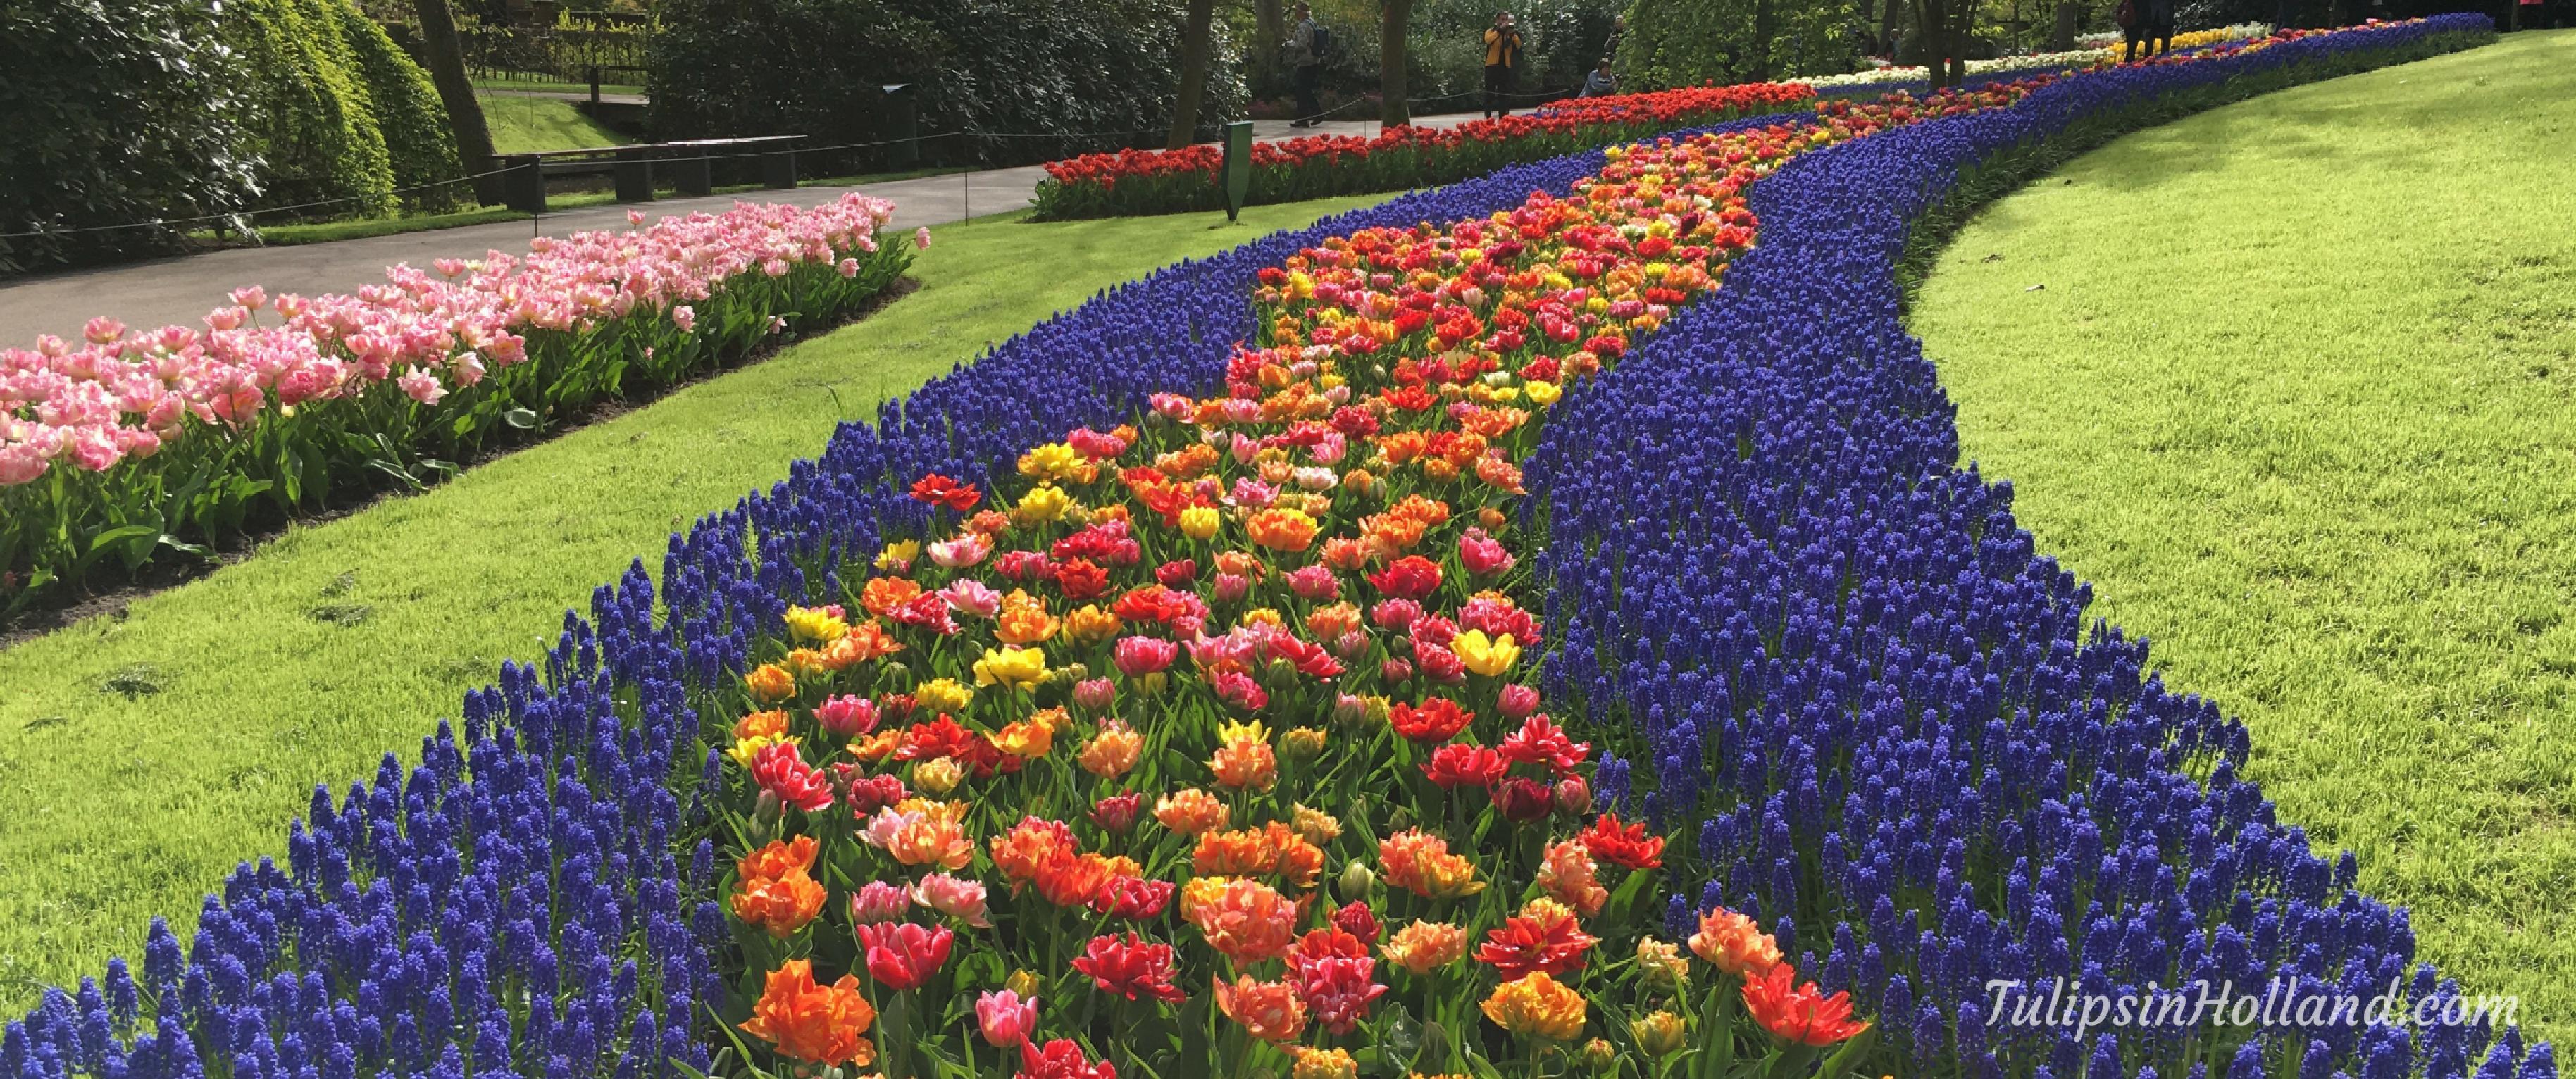 gardens - tulips in holland